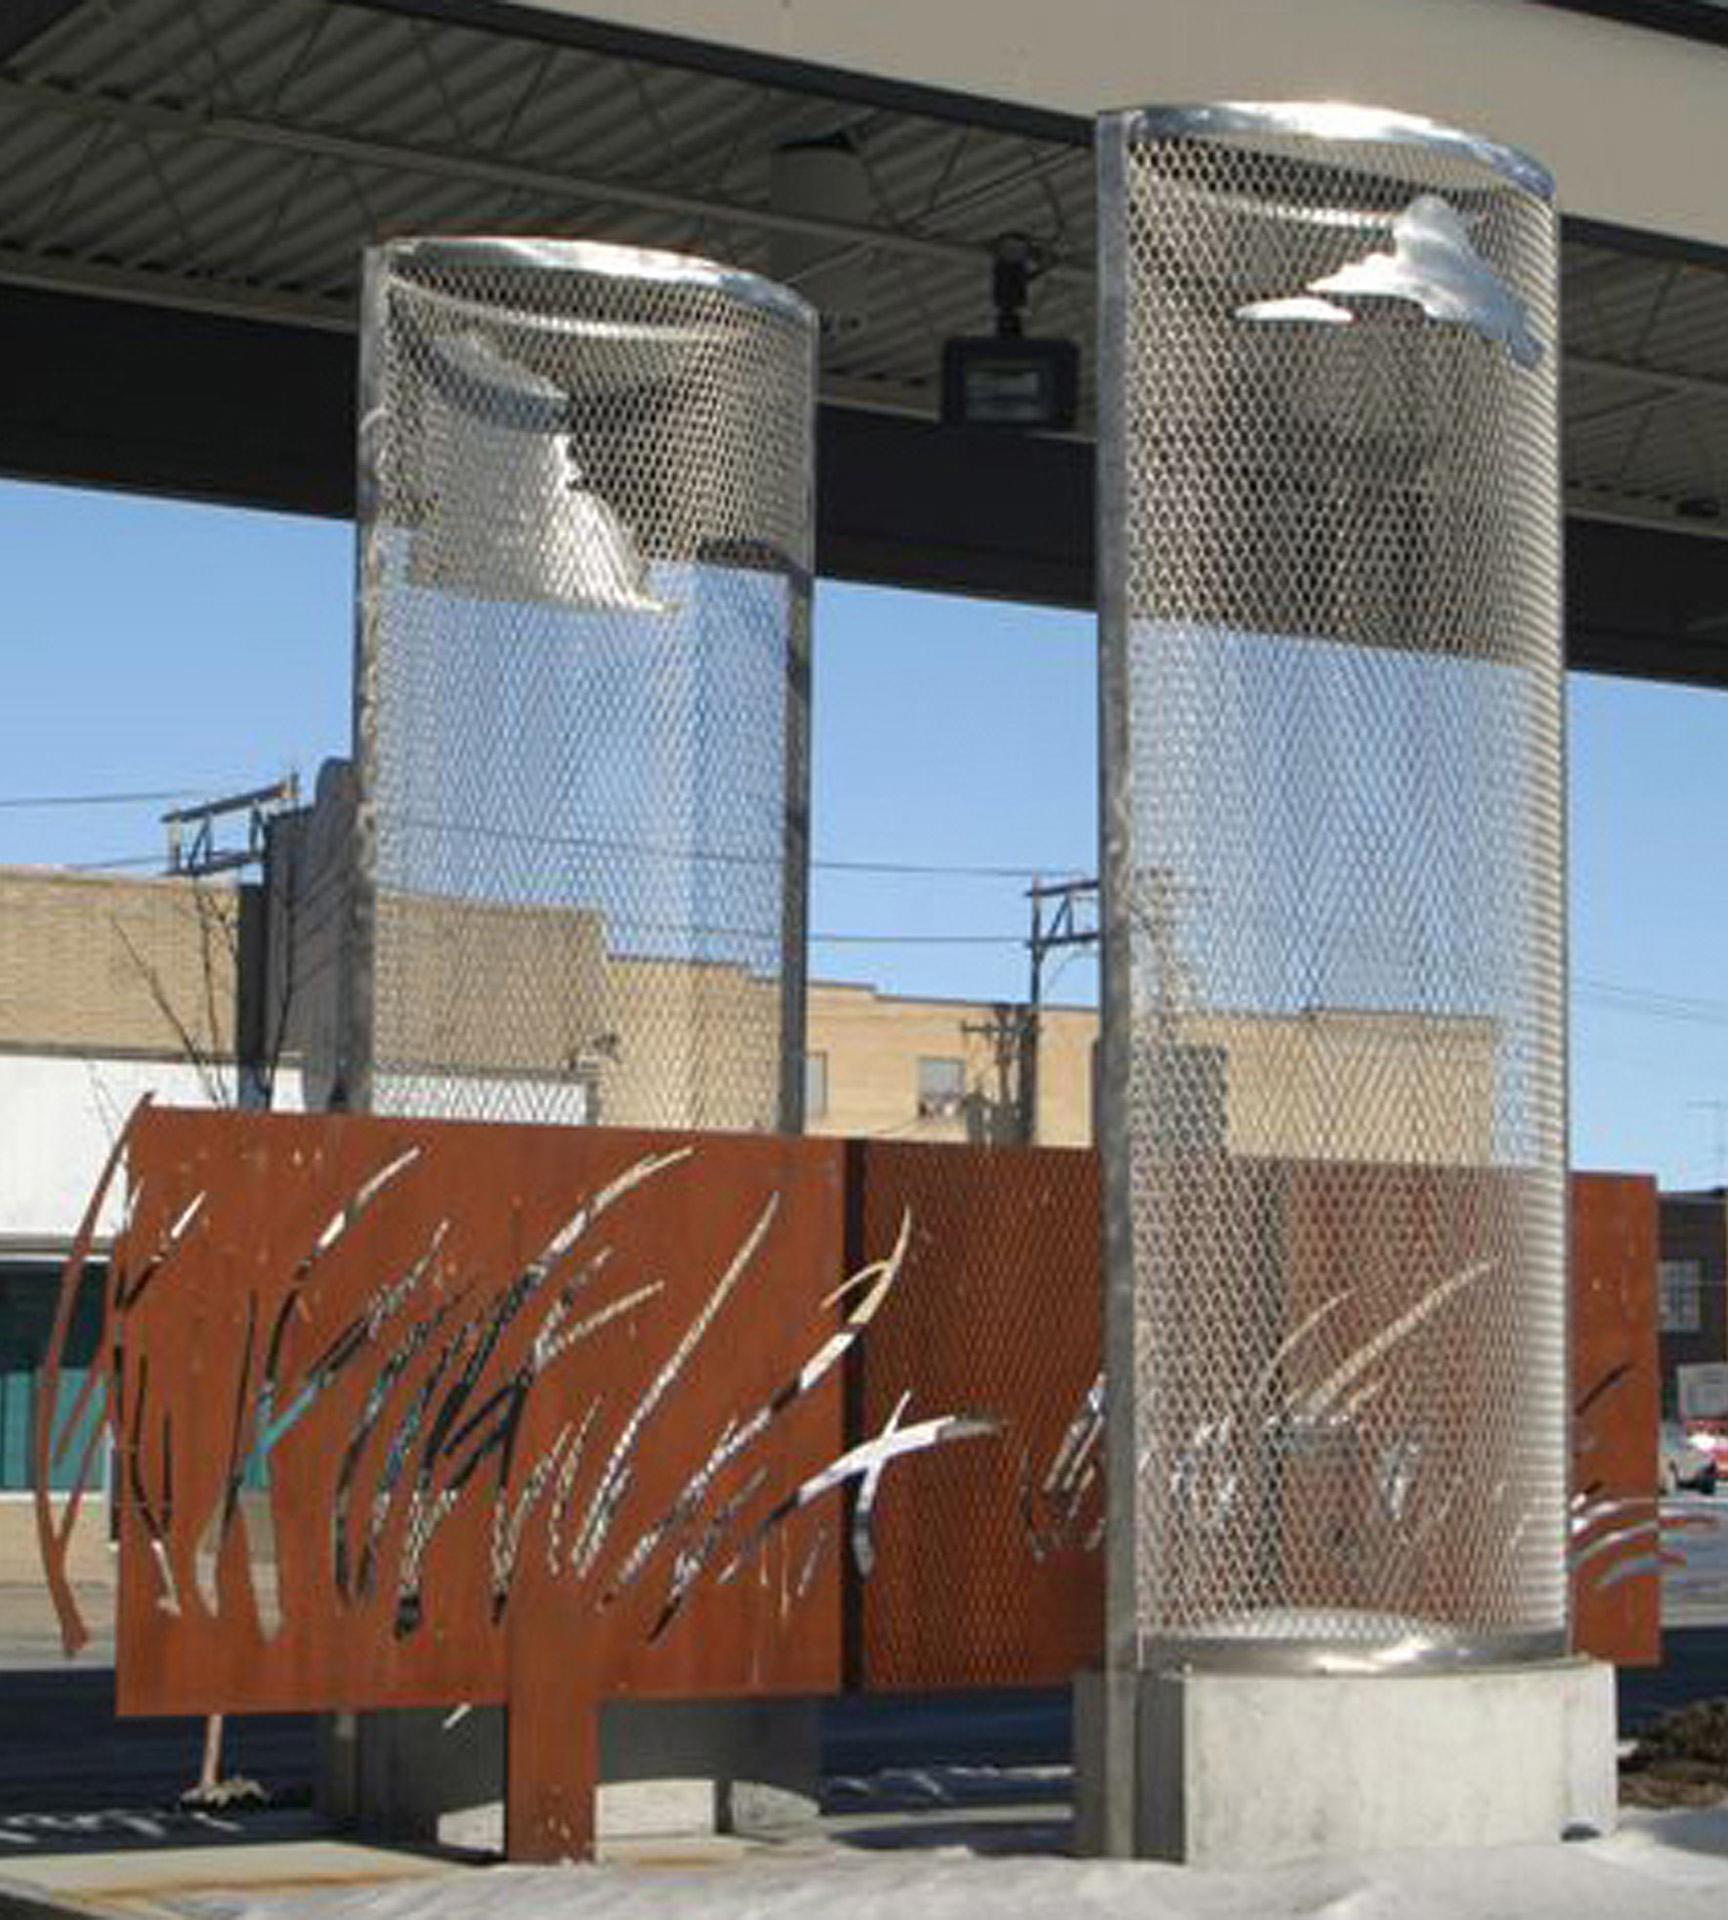 Earth : Heaven / Prairie : Sky , Fargo Metro Transit, 12' x 8' x 14', stainless steel expanded metal, Corten steel, concrete.